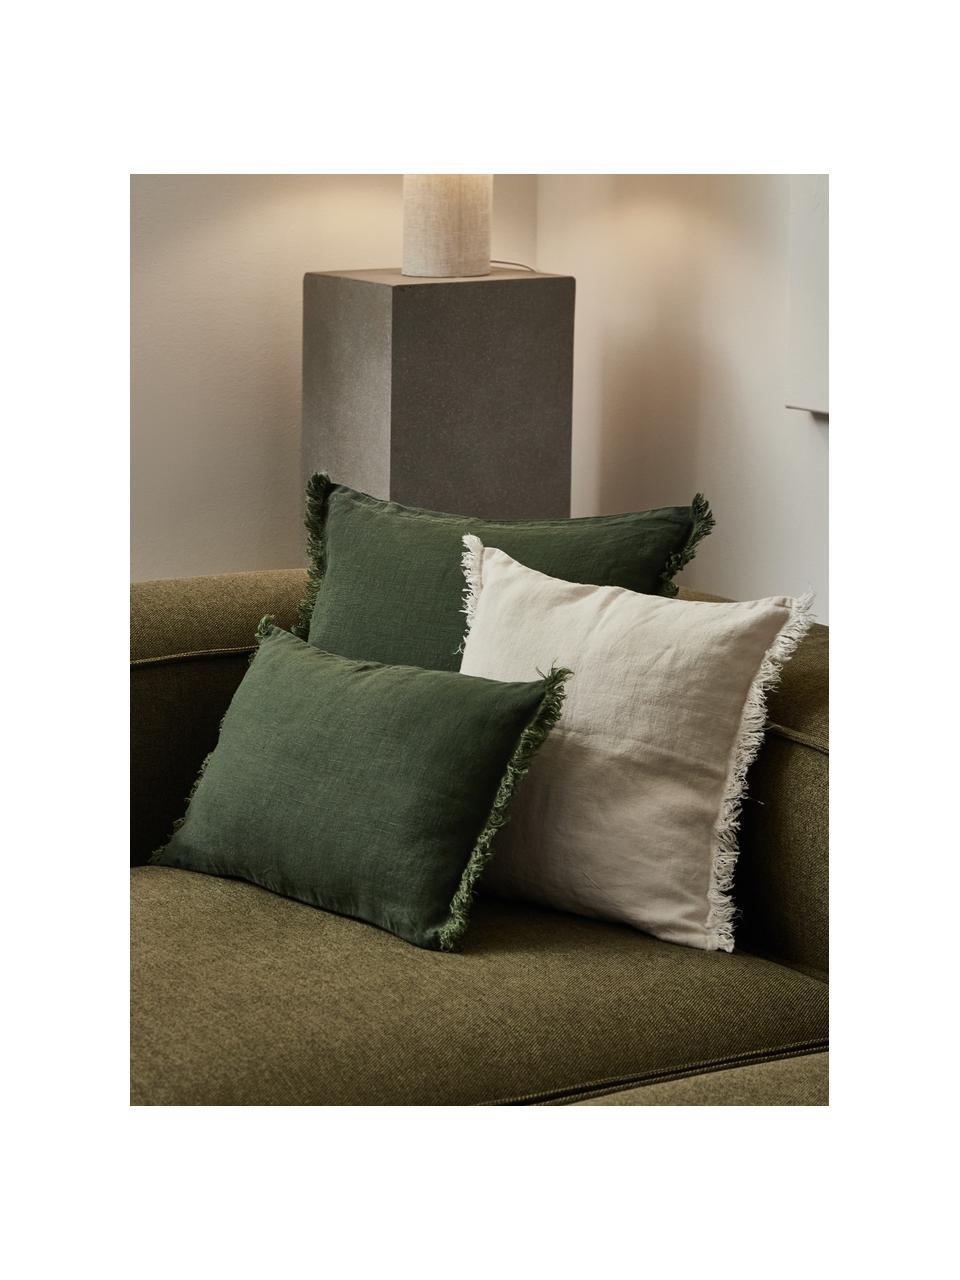 Linnen kussenhoes Luana in donkergroen met franjes, 100% linnen, Groen, 40 x 40 cm